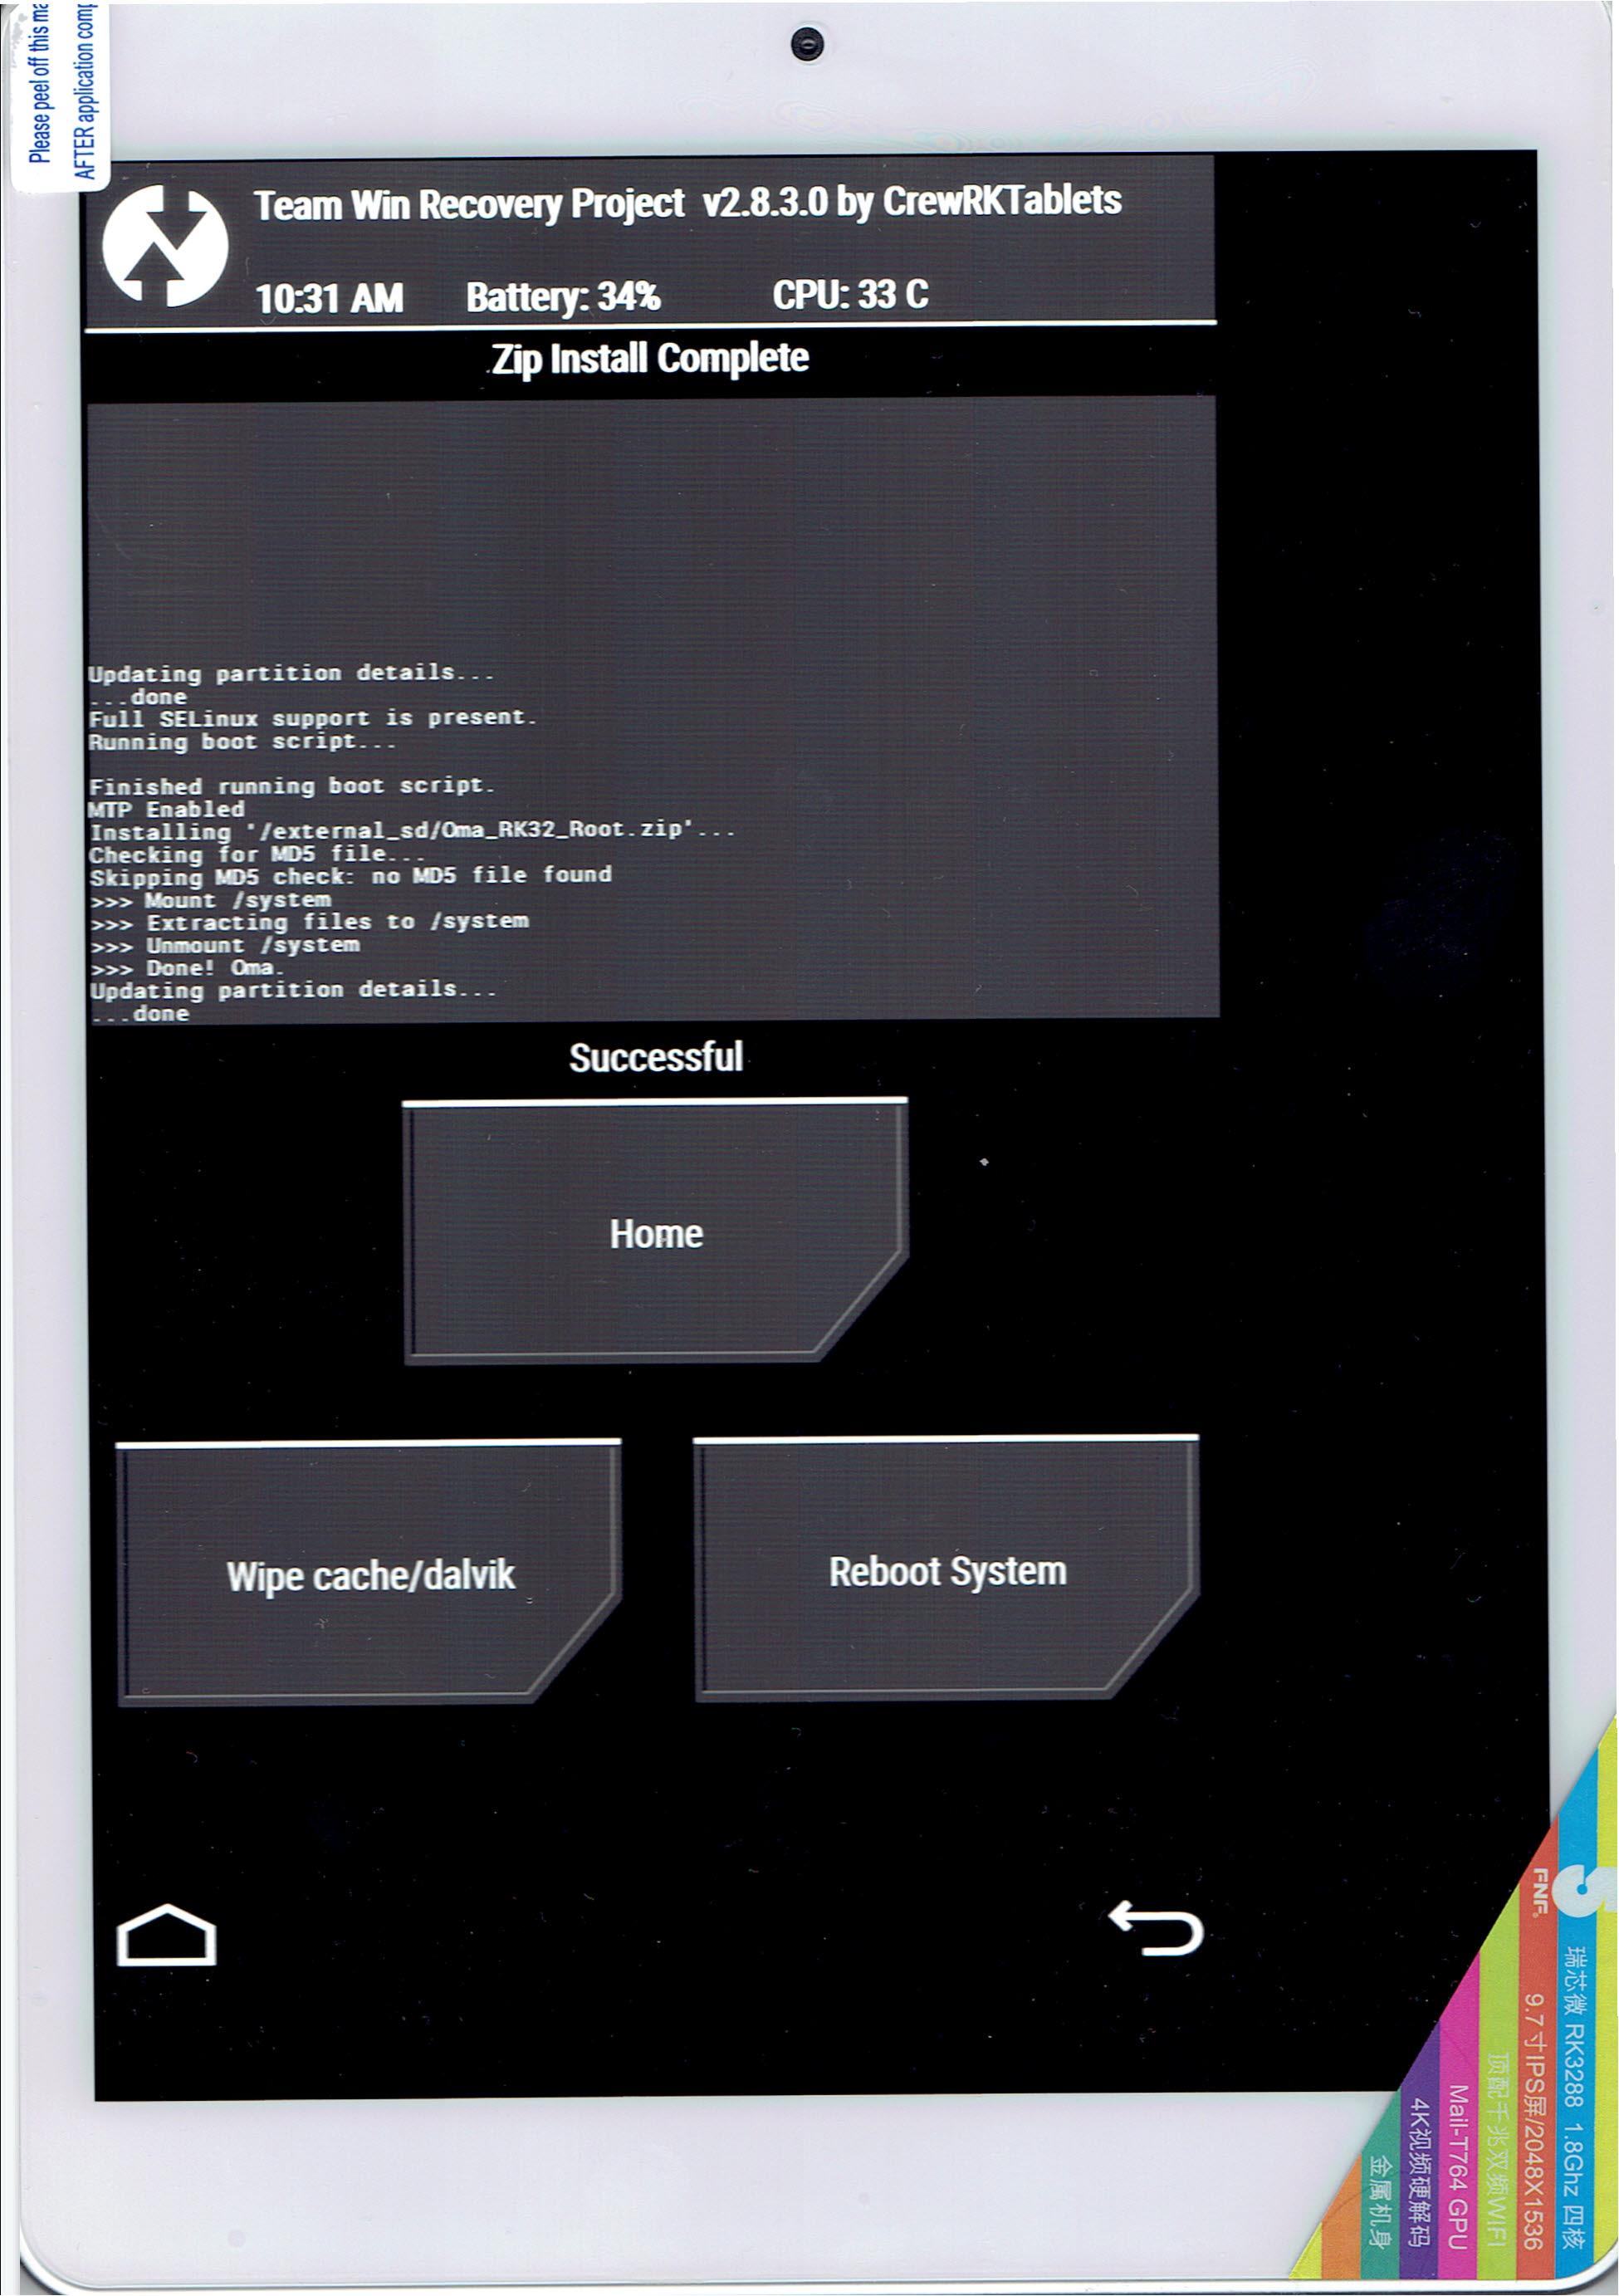 b-install_zip.jpg